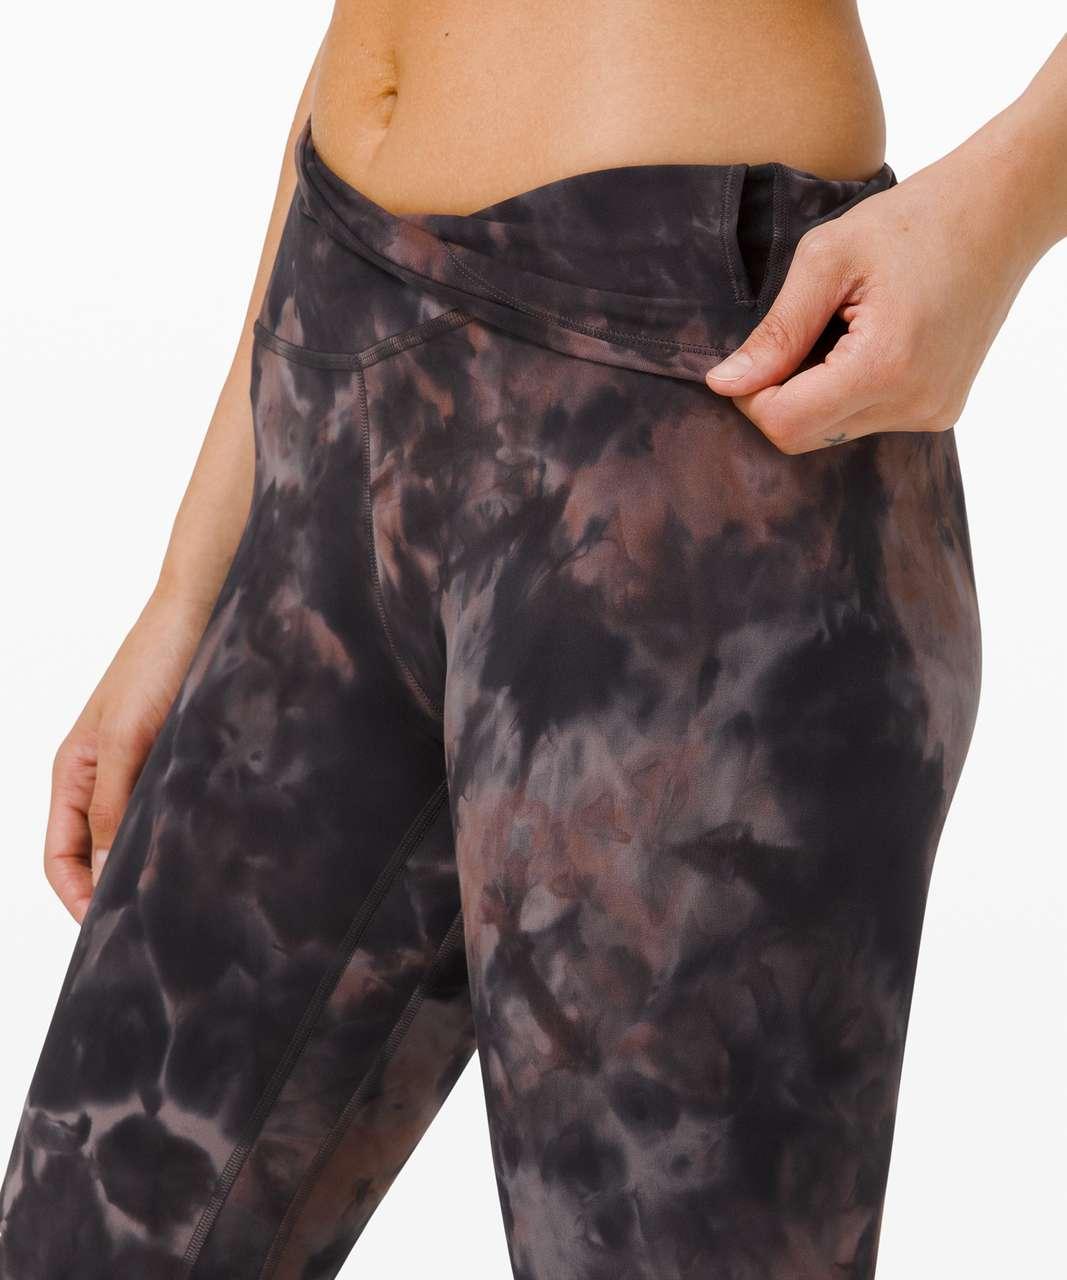 "Lululemon Align Pant 25"" *Diamond Dye - Diamond Dye Graphite Grey Pink Pastel"